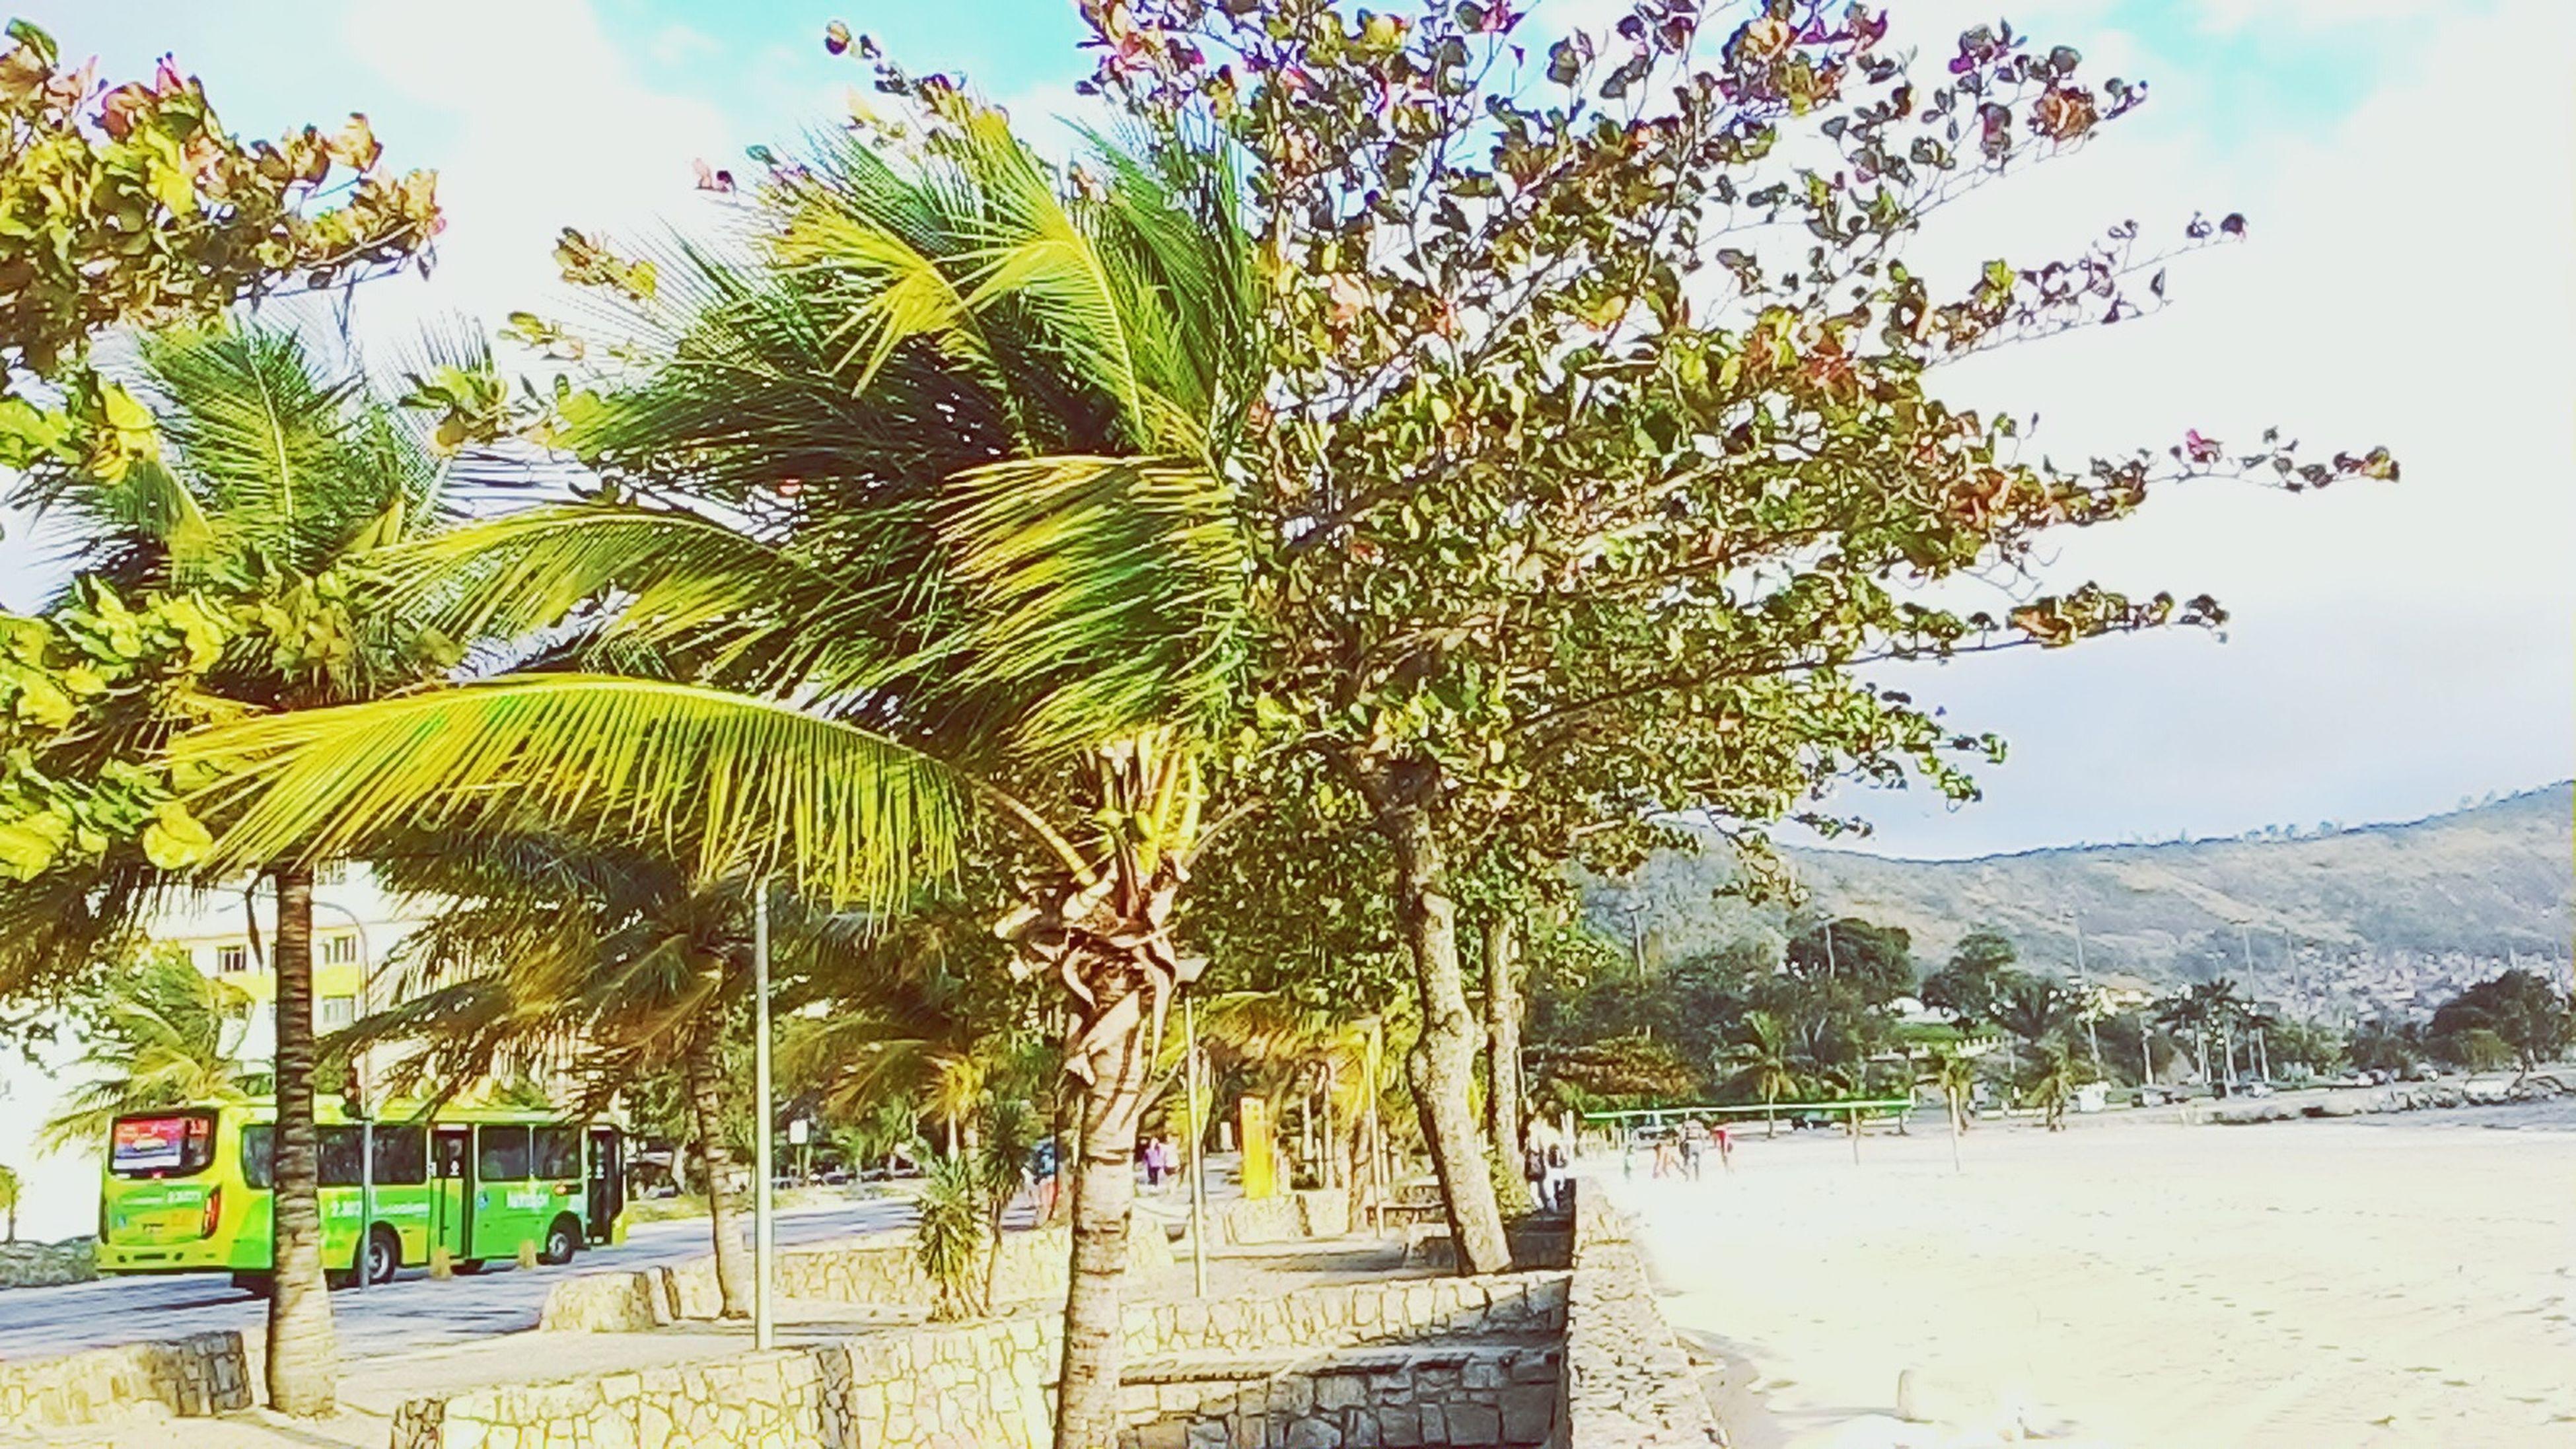 Charitas Niterói Natural Guiadeniteroi SãoFrancisco Nature Beach Thecoconutitree